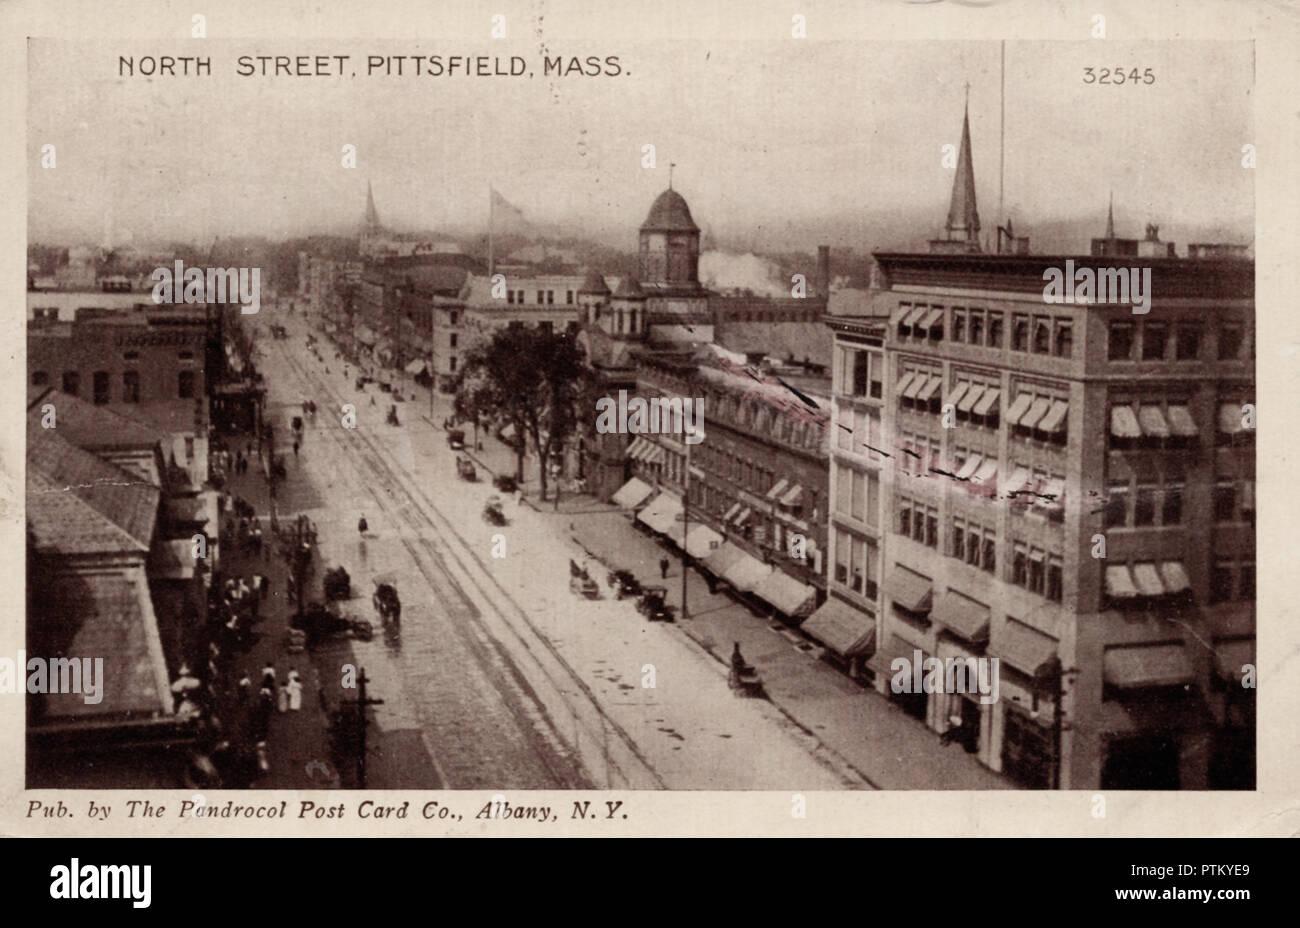 North Street Pittsfield, MA, una postal antigua Imagen De Stock